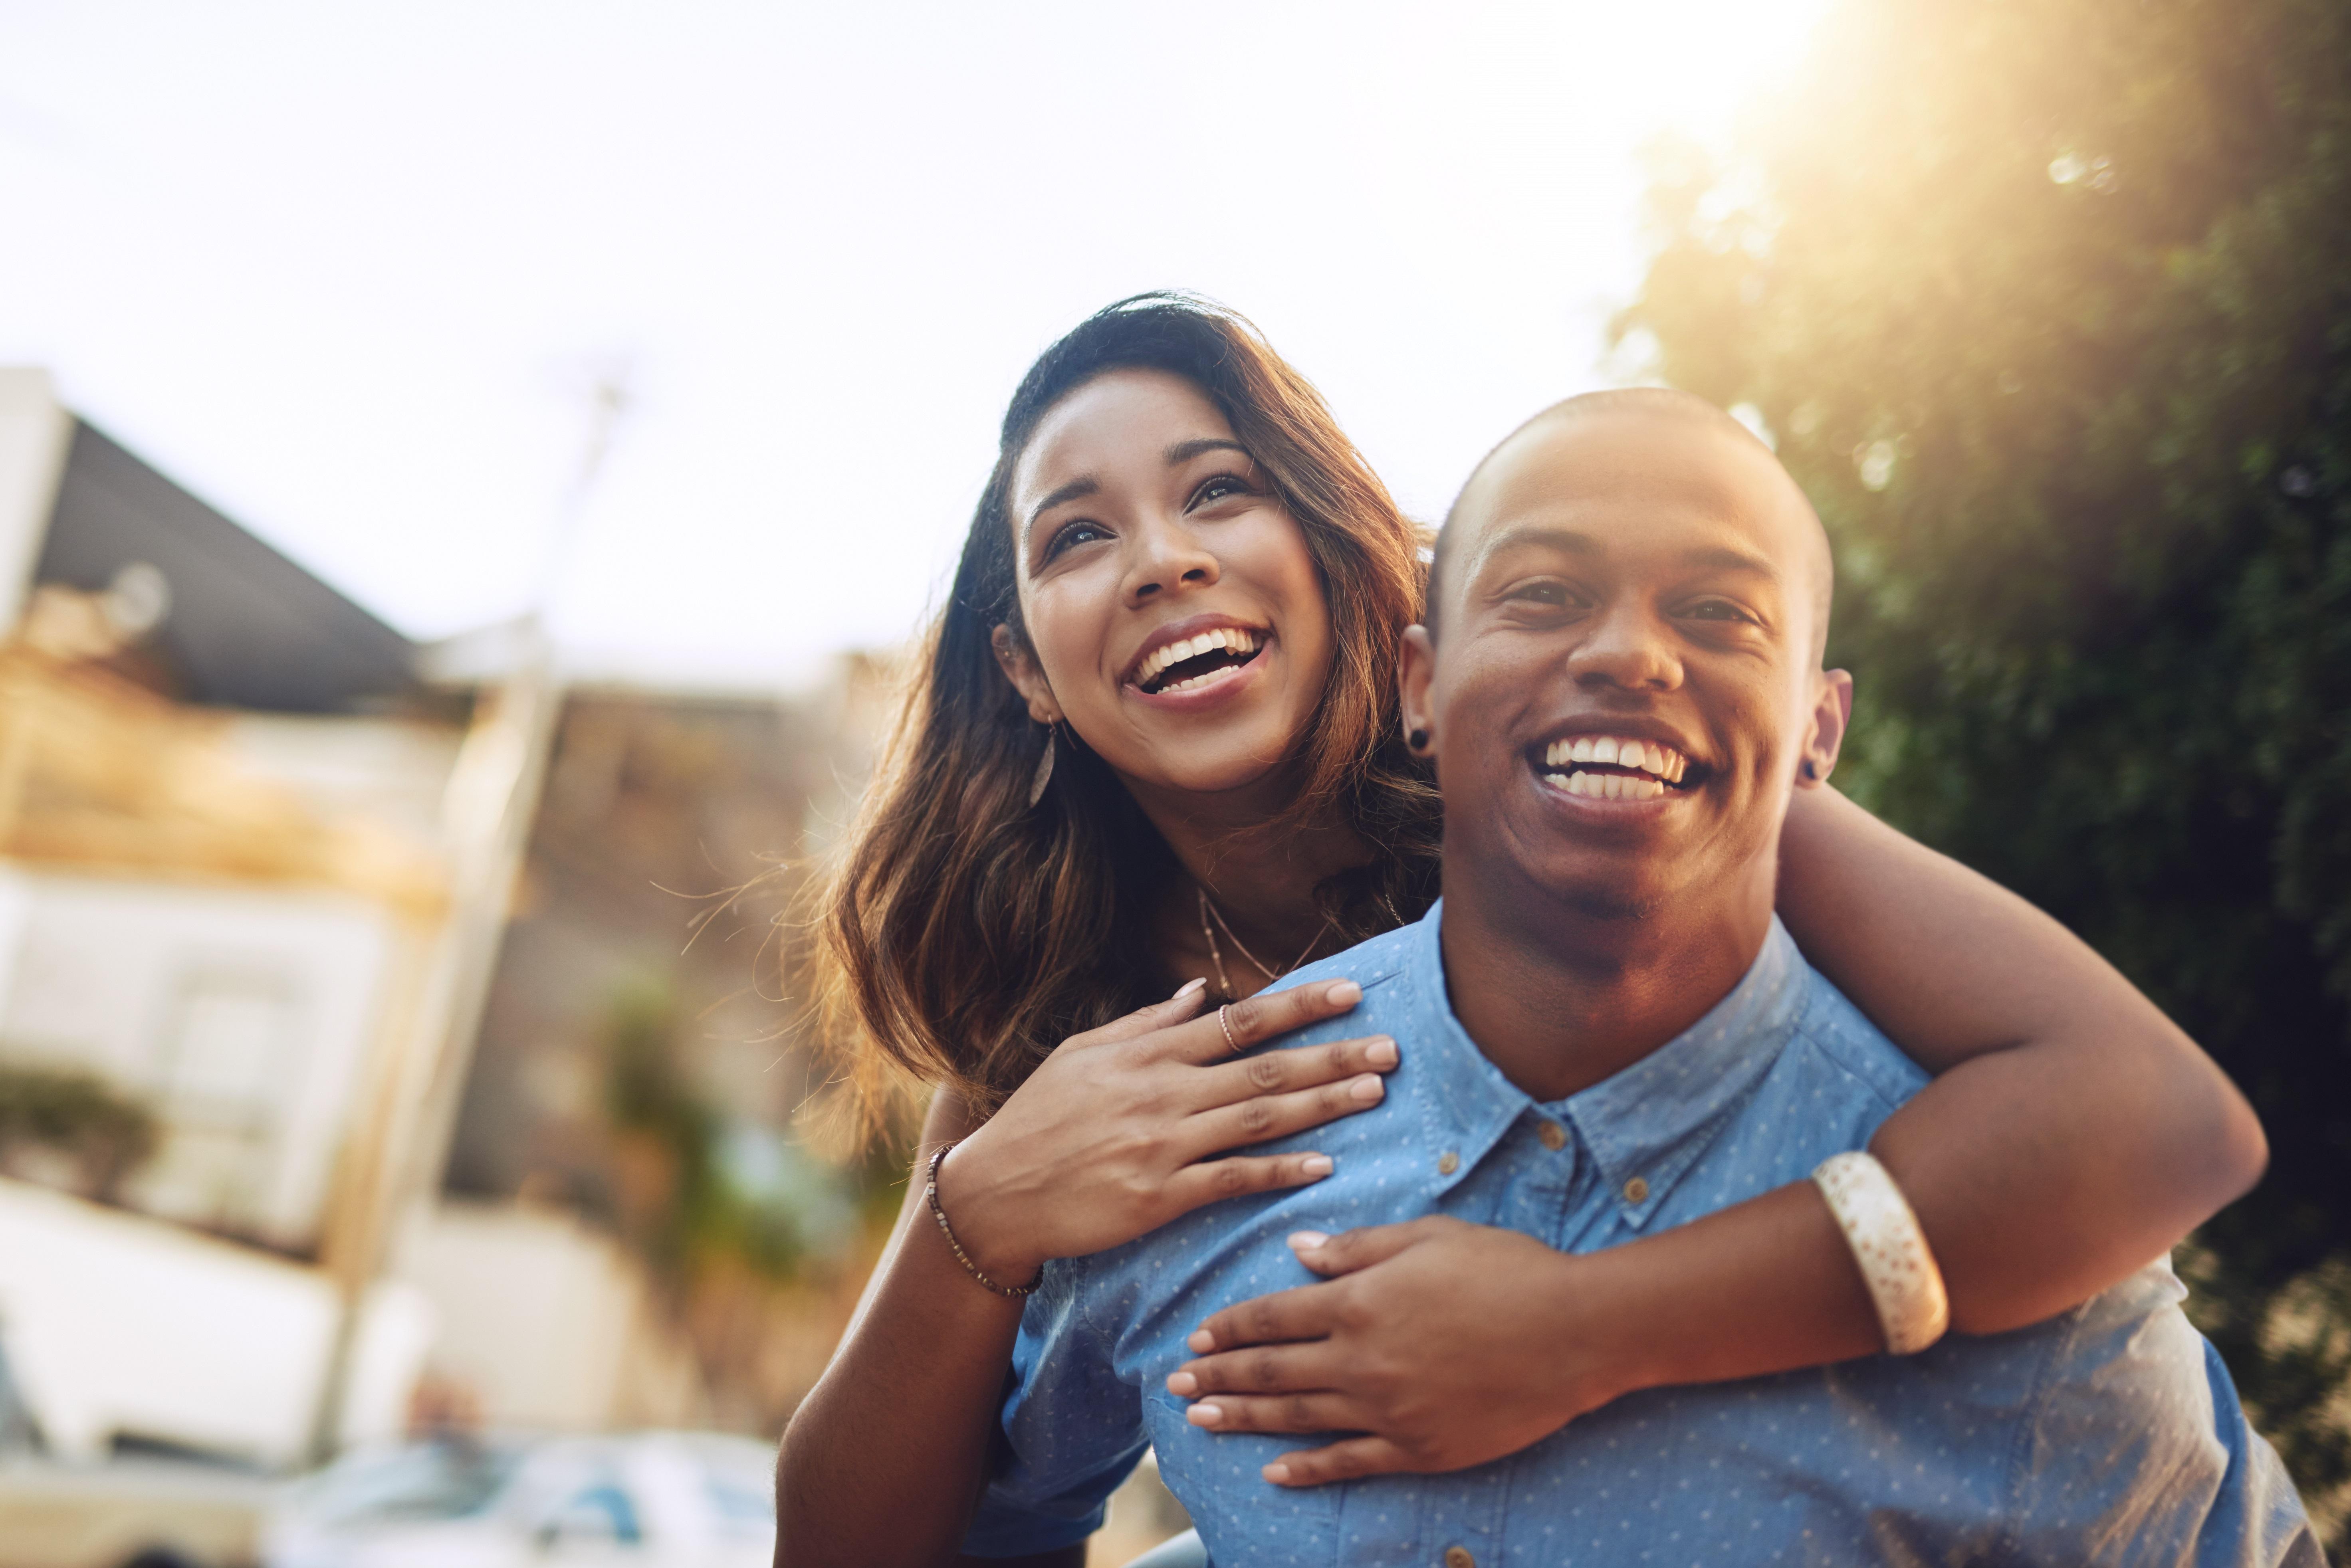 A happy young couple enjoying a piggyback ride outdoors